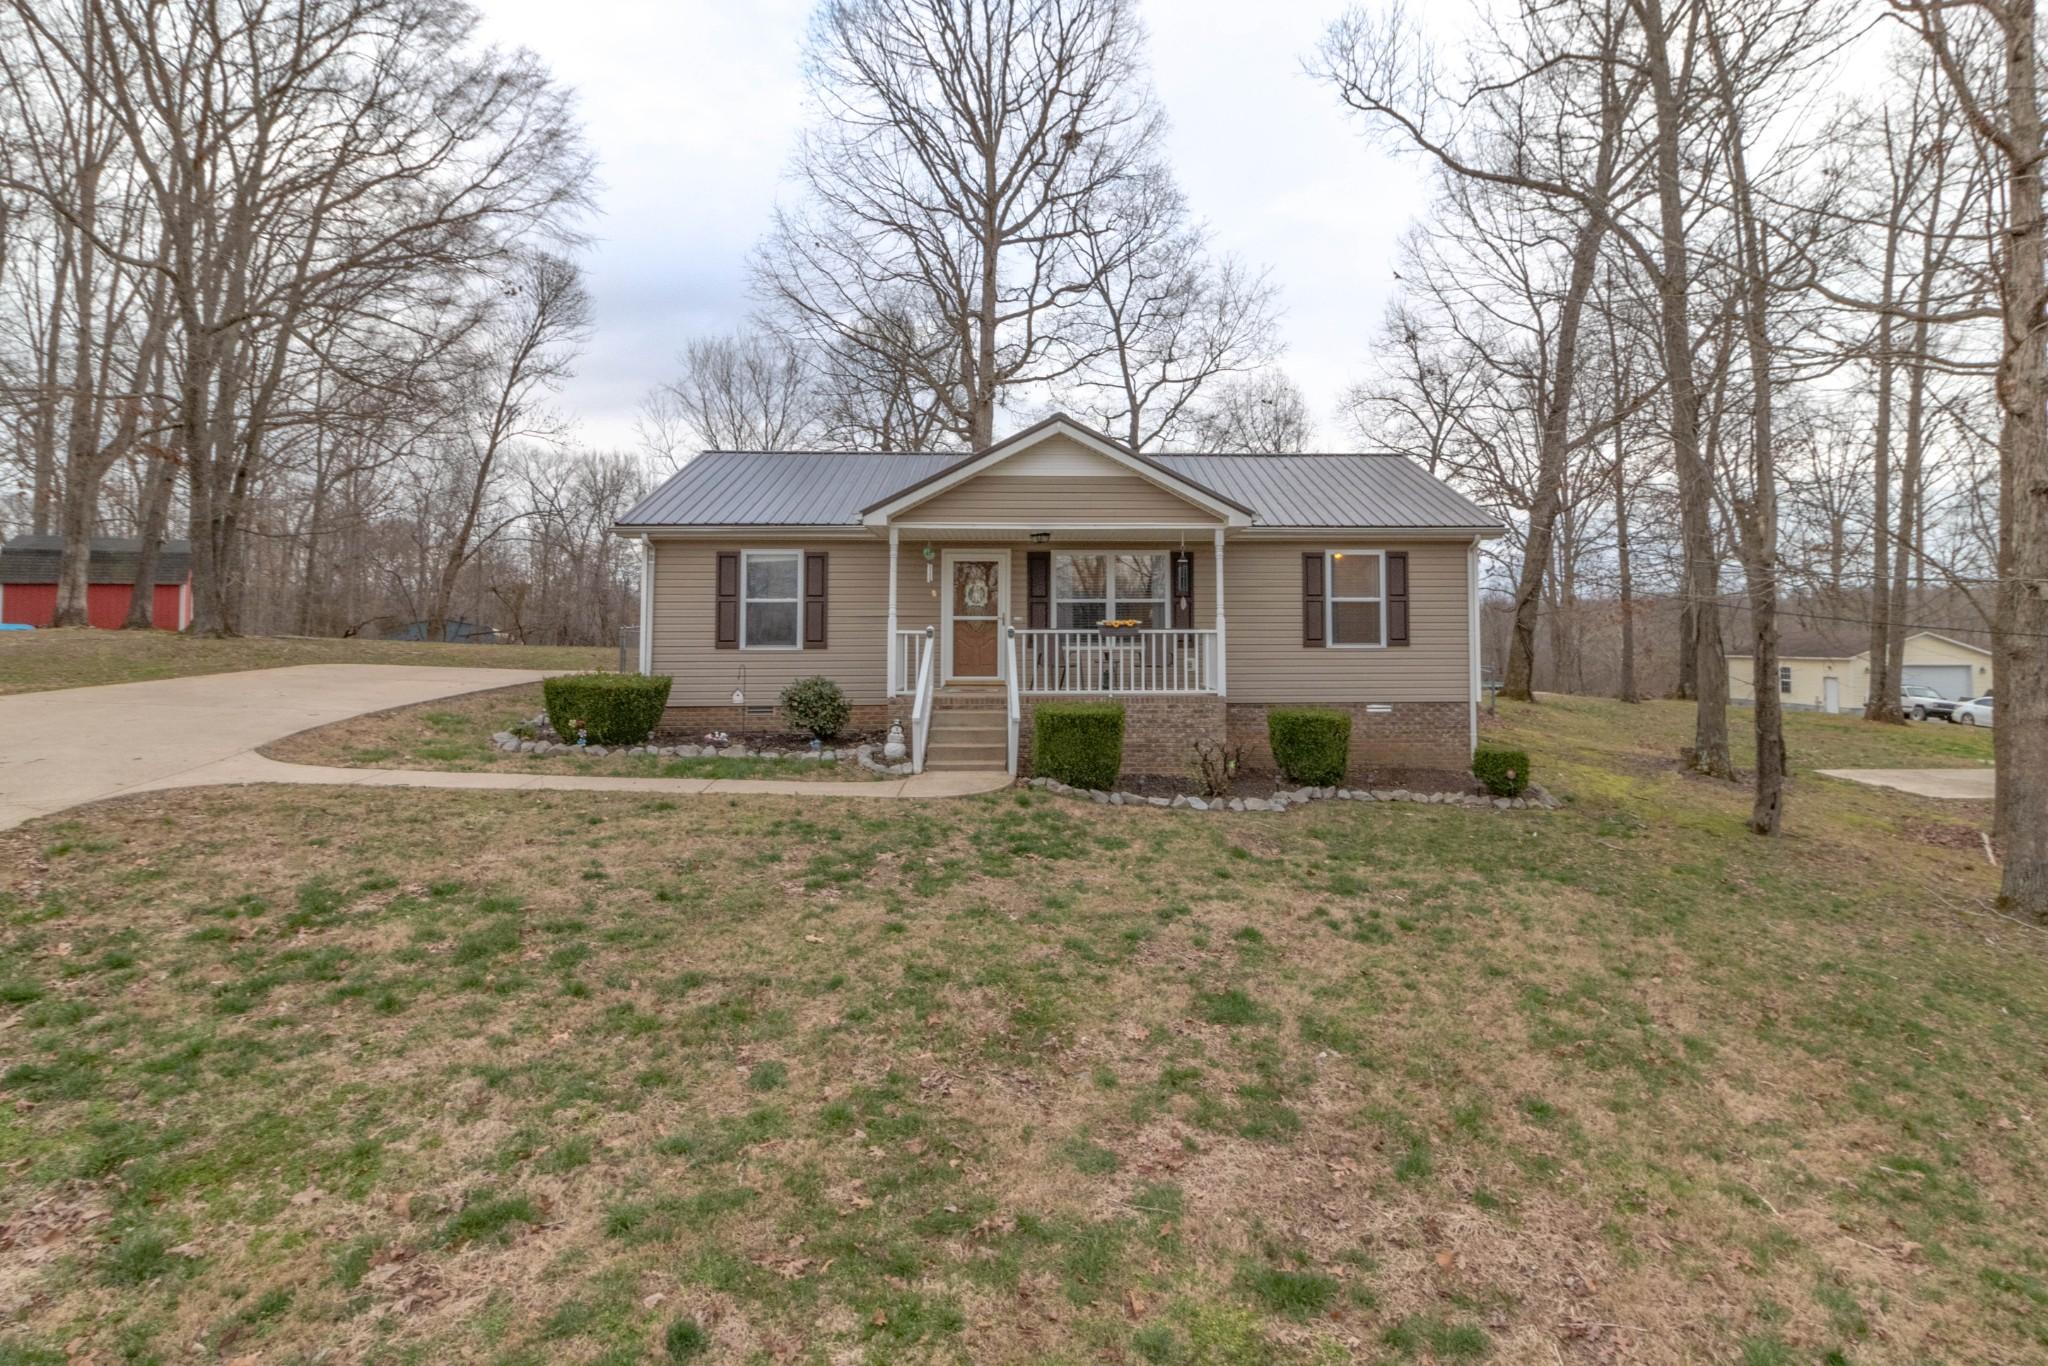 1797 Mimi Rd, Clarksville, TN 37040 - Clarksville, TN real estate listing